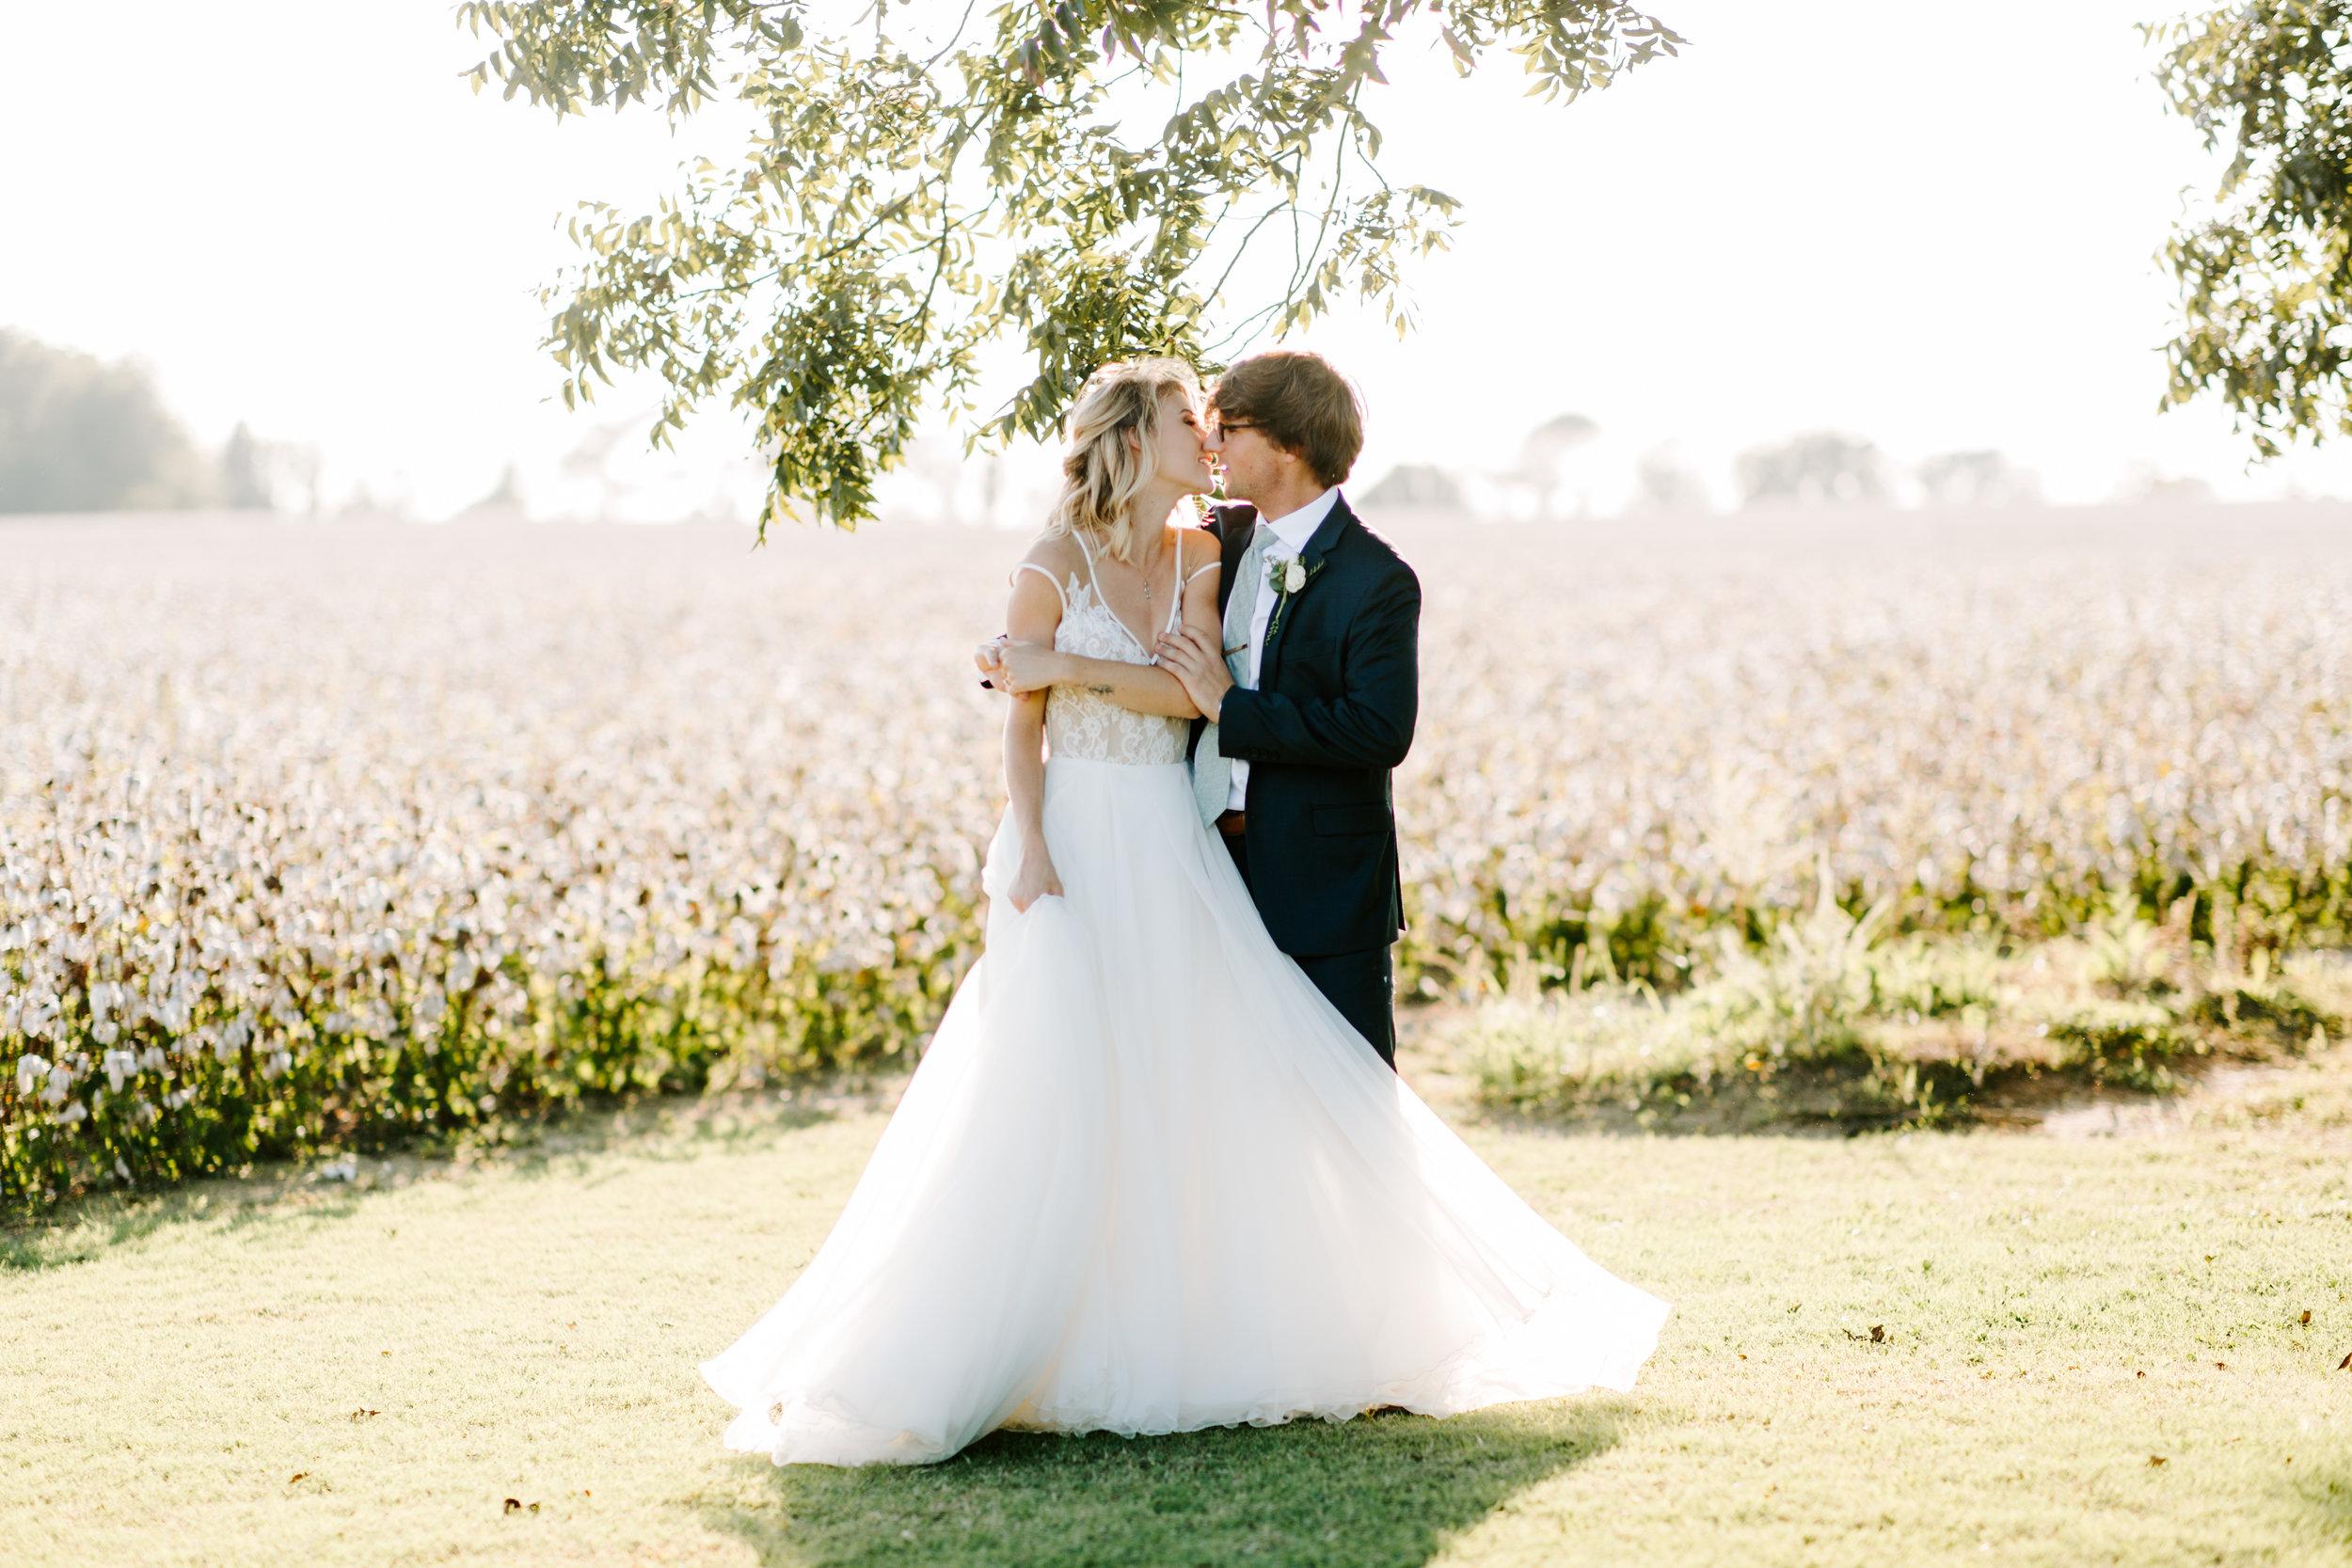 knoxville-wedding-photographer-210.JPG